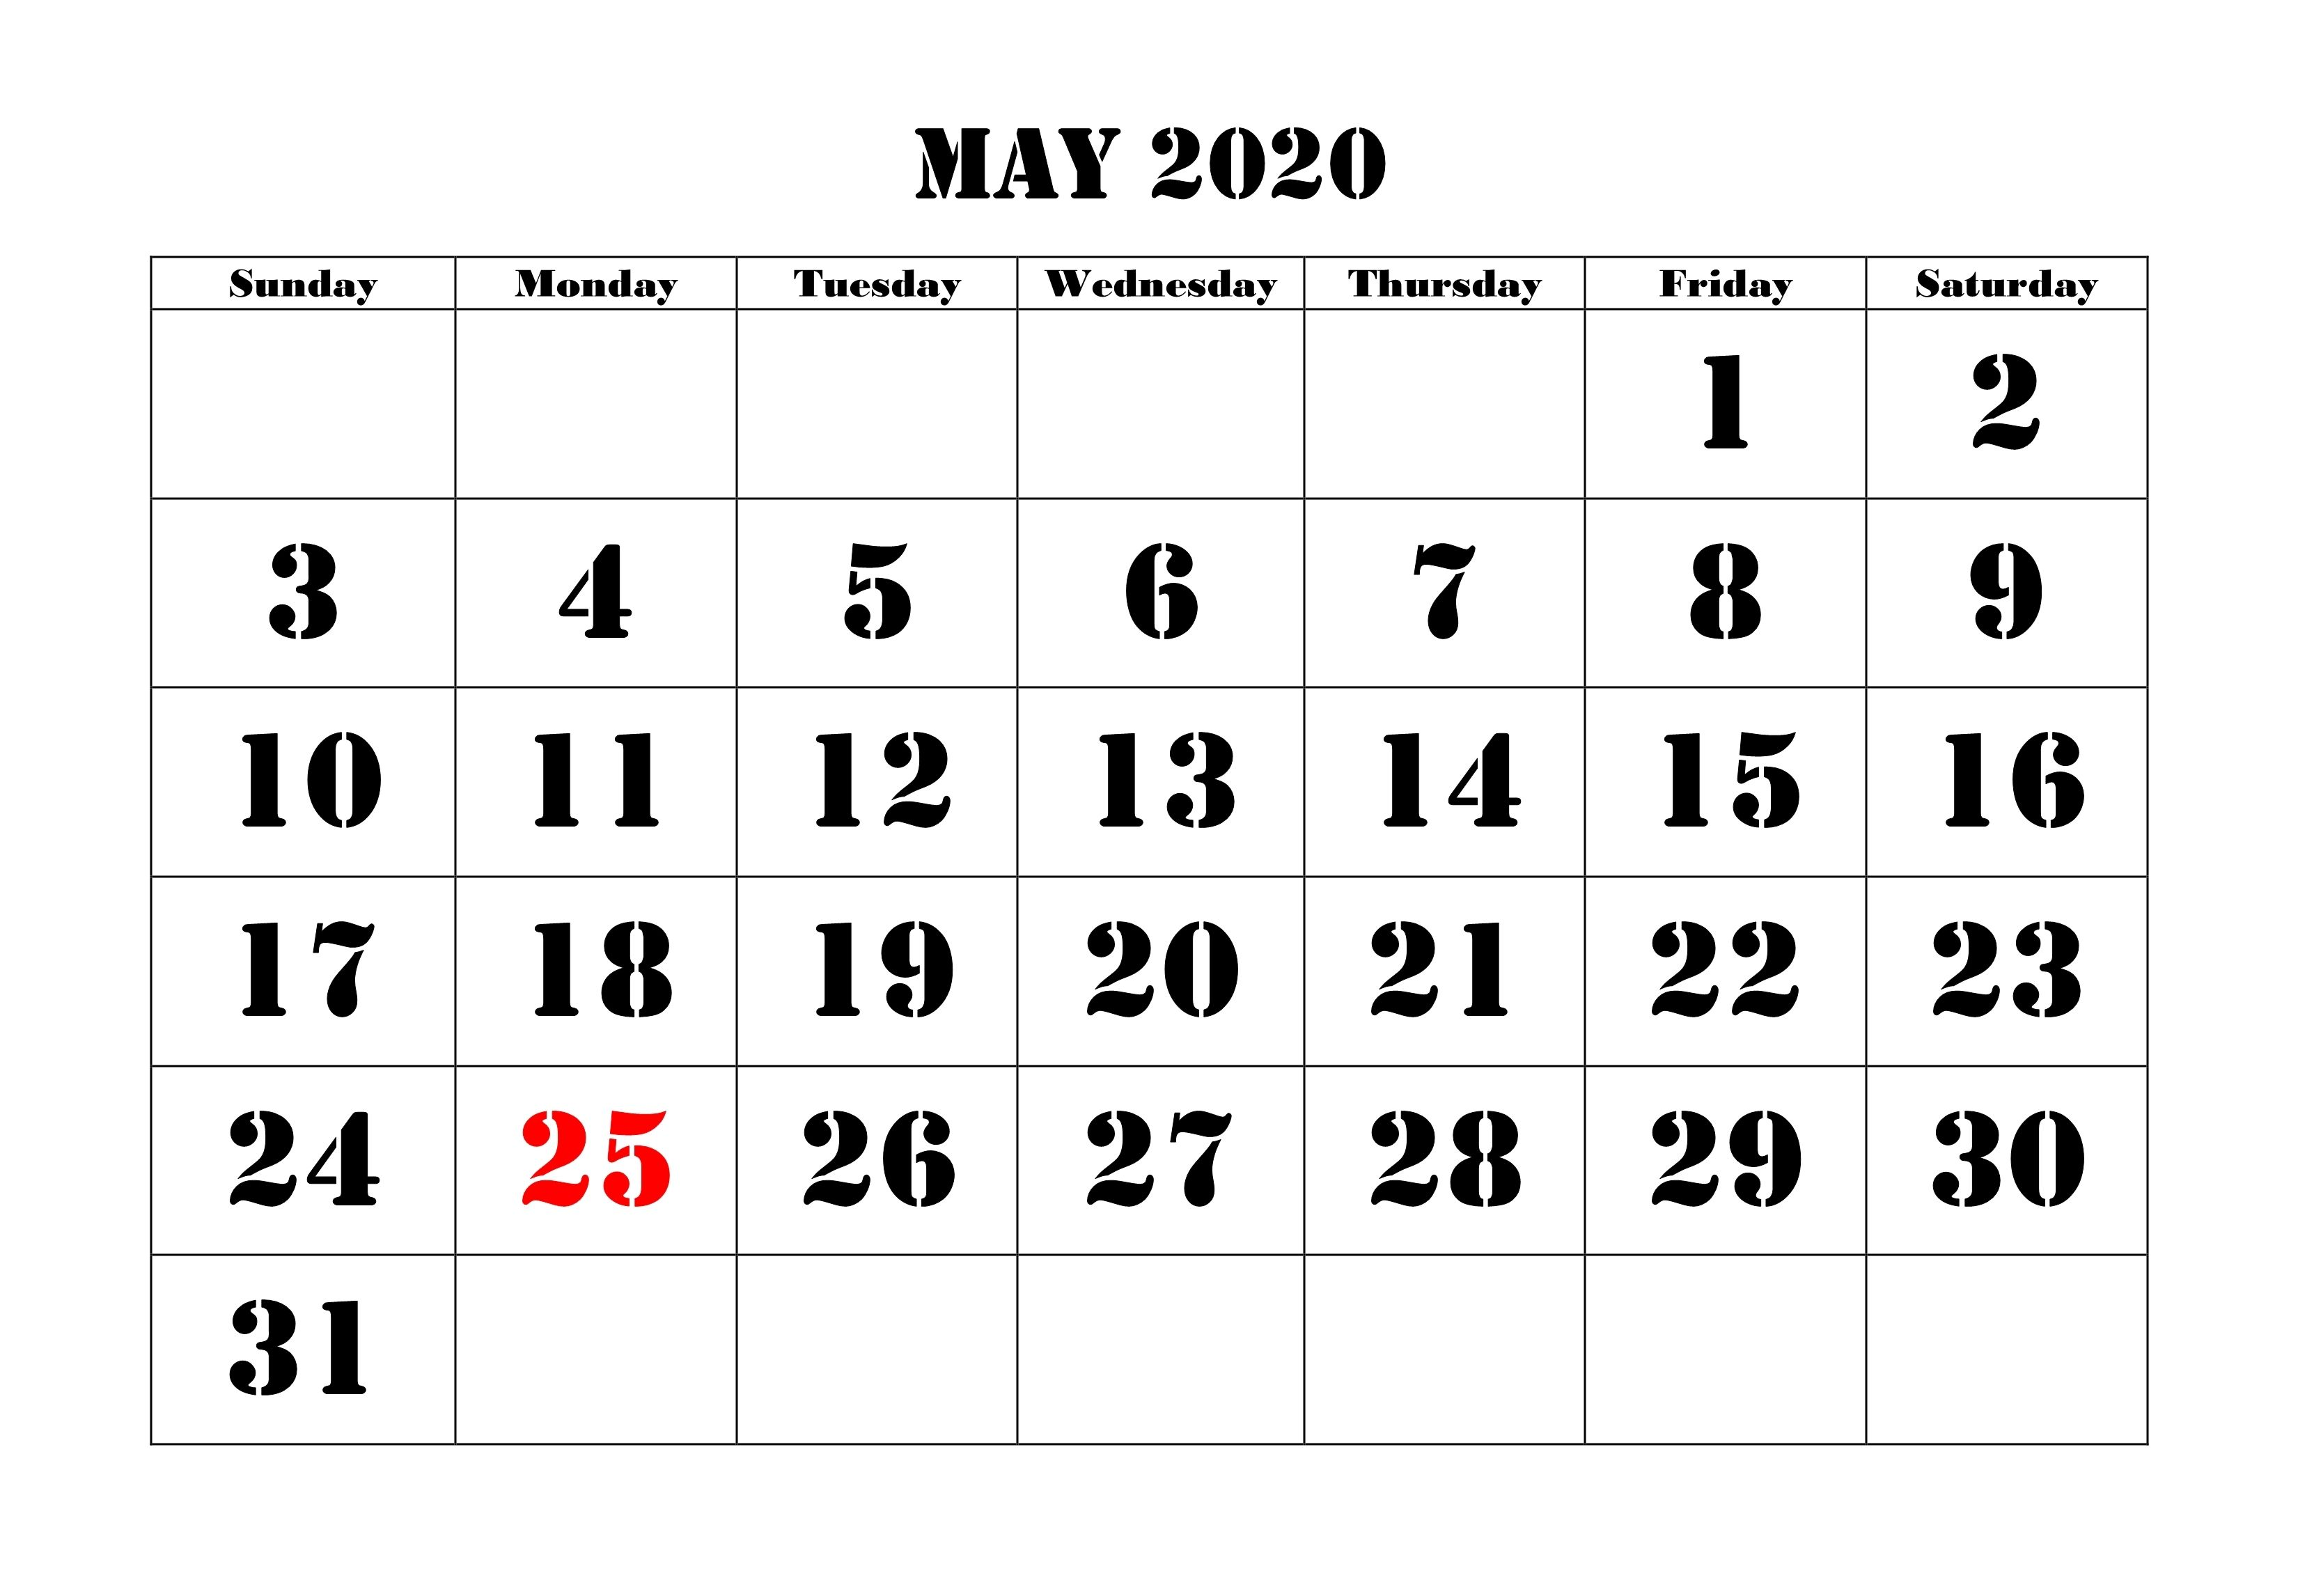 May 2020 Calendar Printable Template With Holidays Calendar